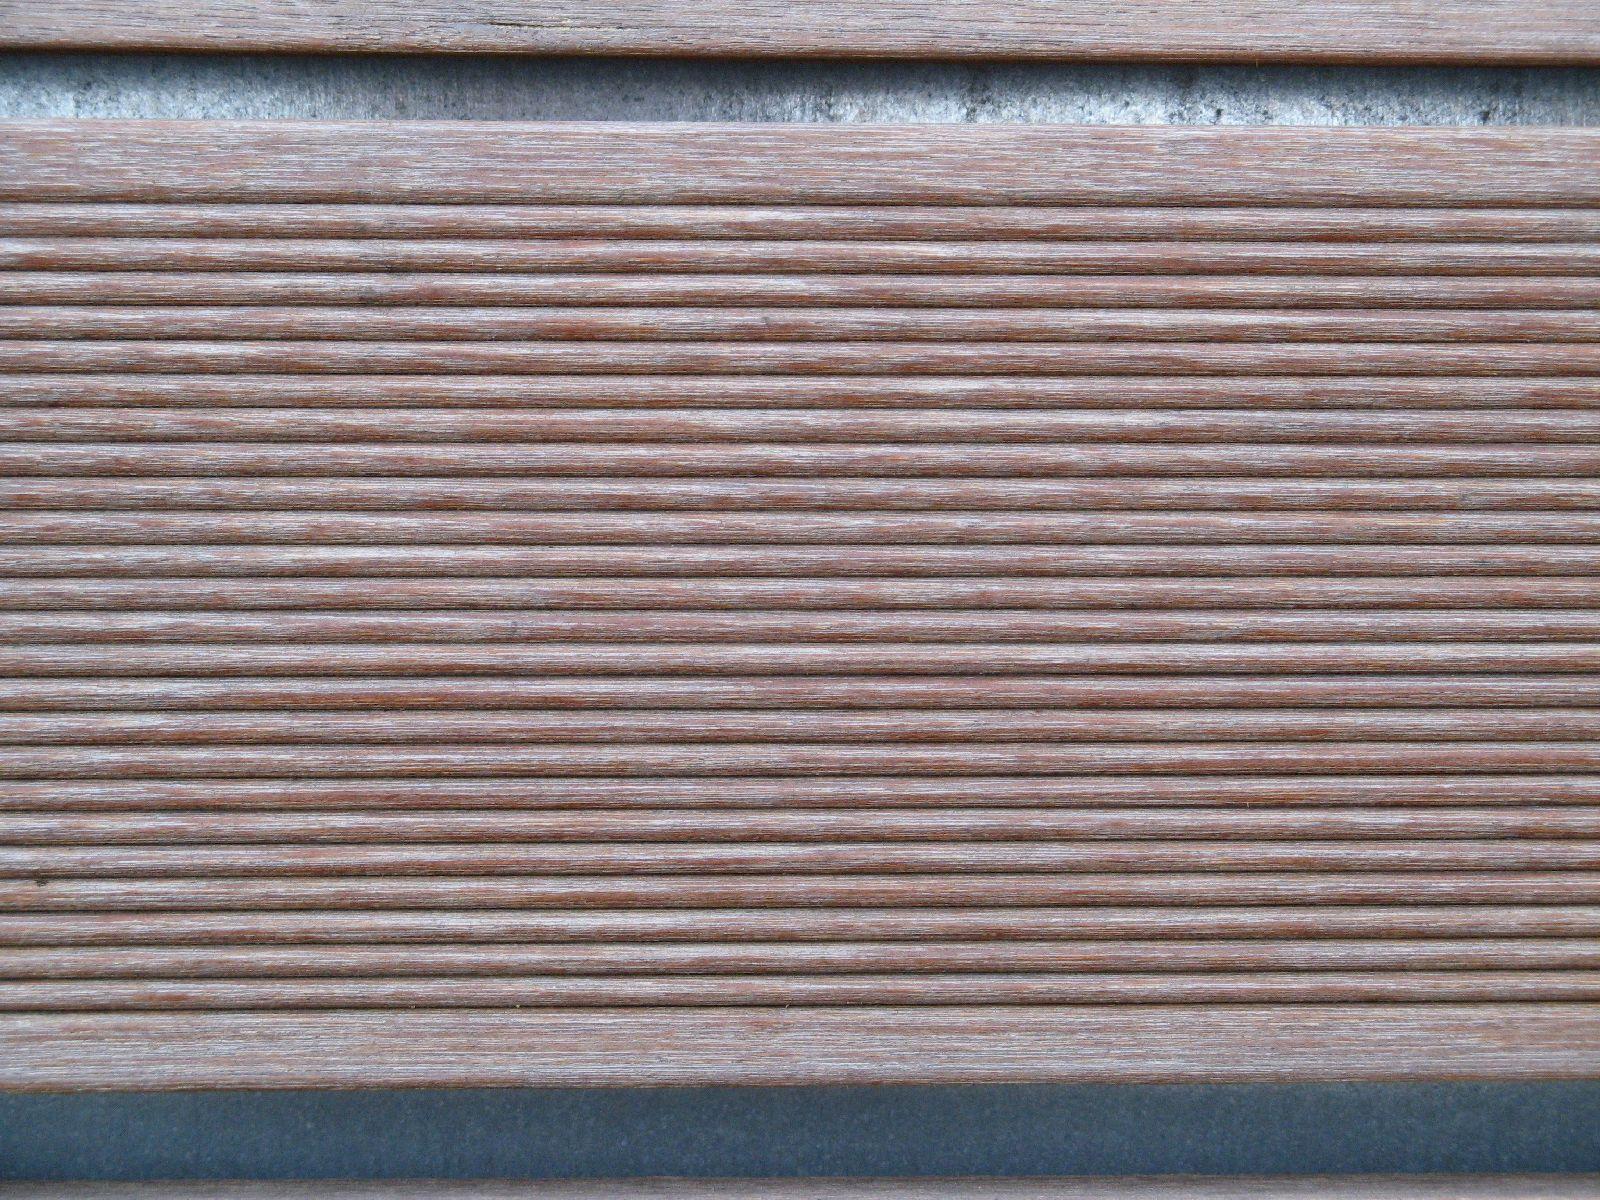 Wood_Textures_B_1582